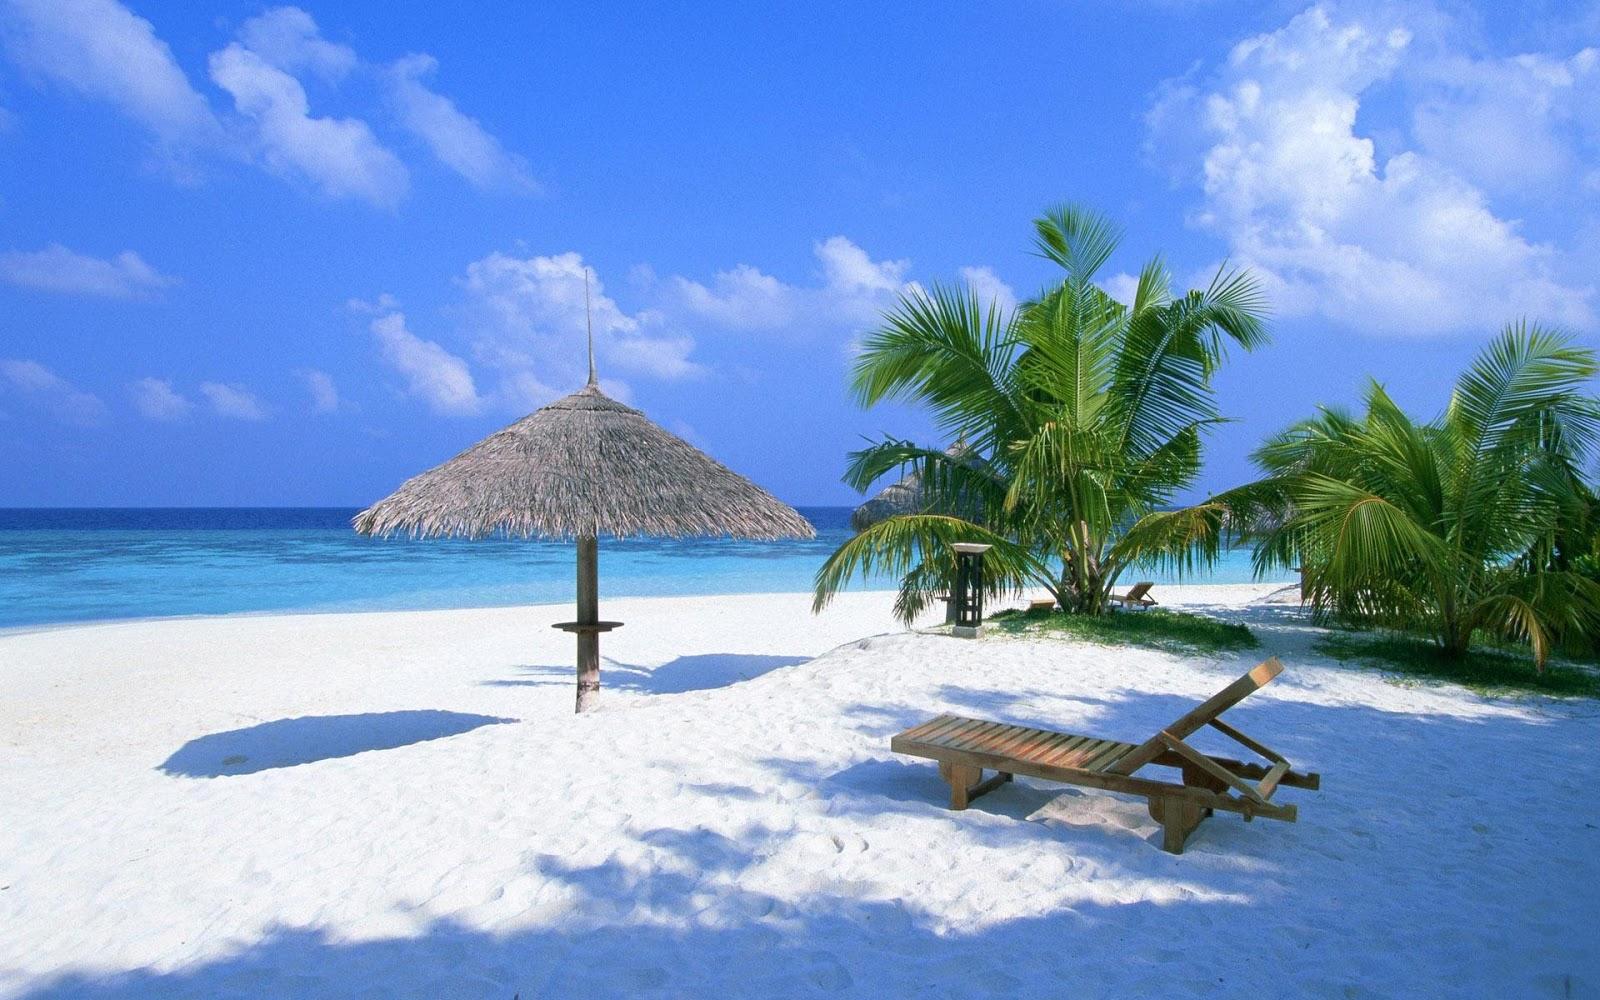 hd hintergrundbilder landschaften meer strand sommer palmen palmenstrand bilder. Black Bedroom Furniture Sets. Home Design Ideas